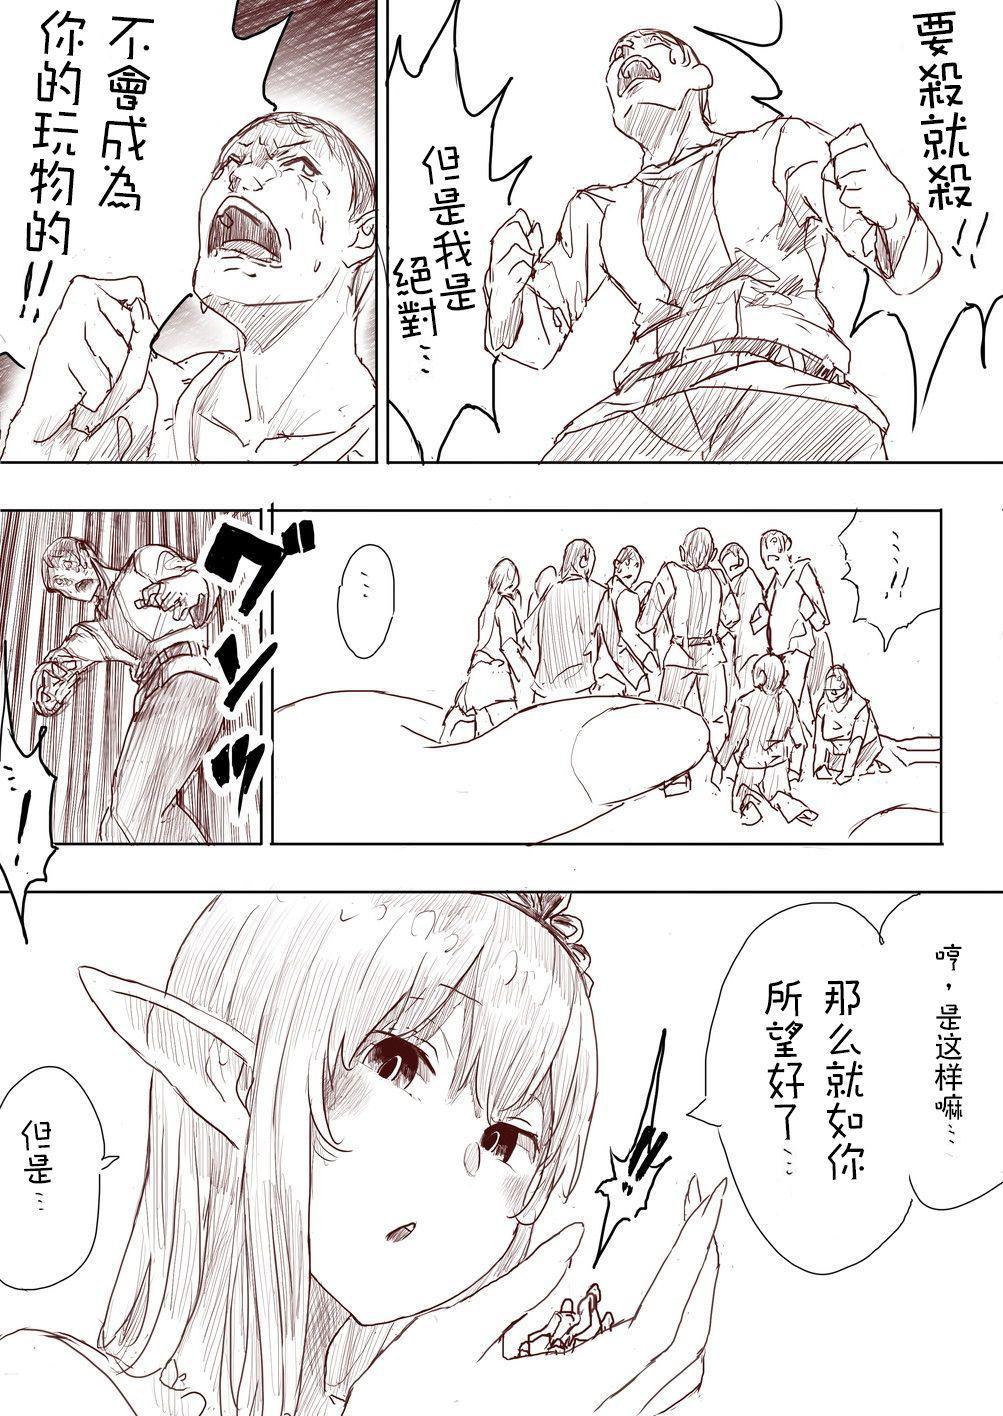 Elf Princess Strikes Back Part1 138